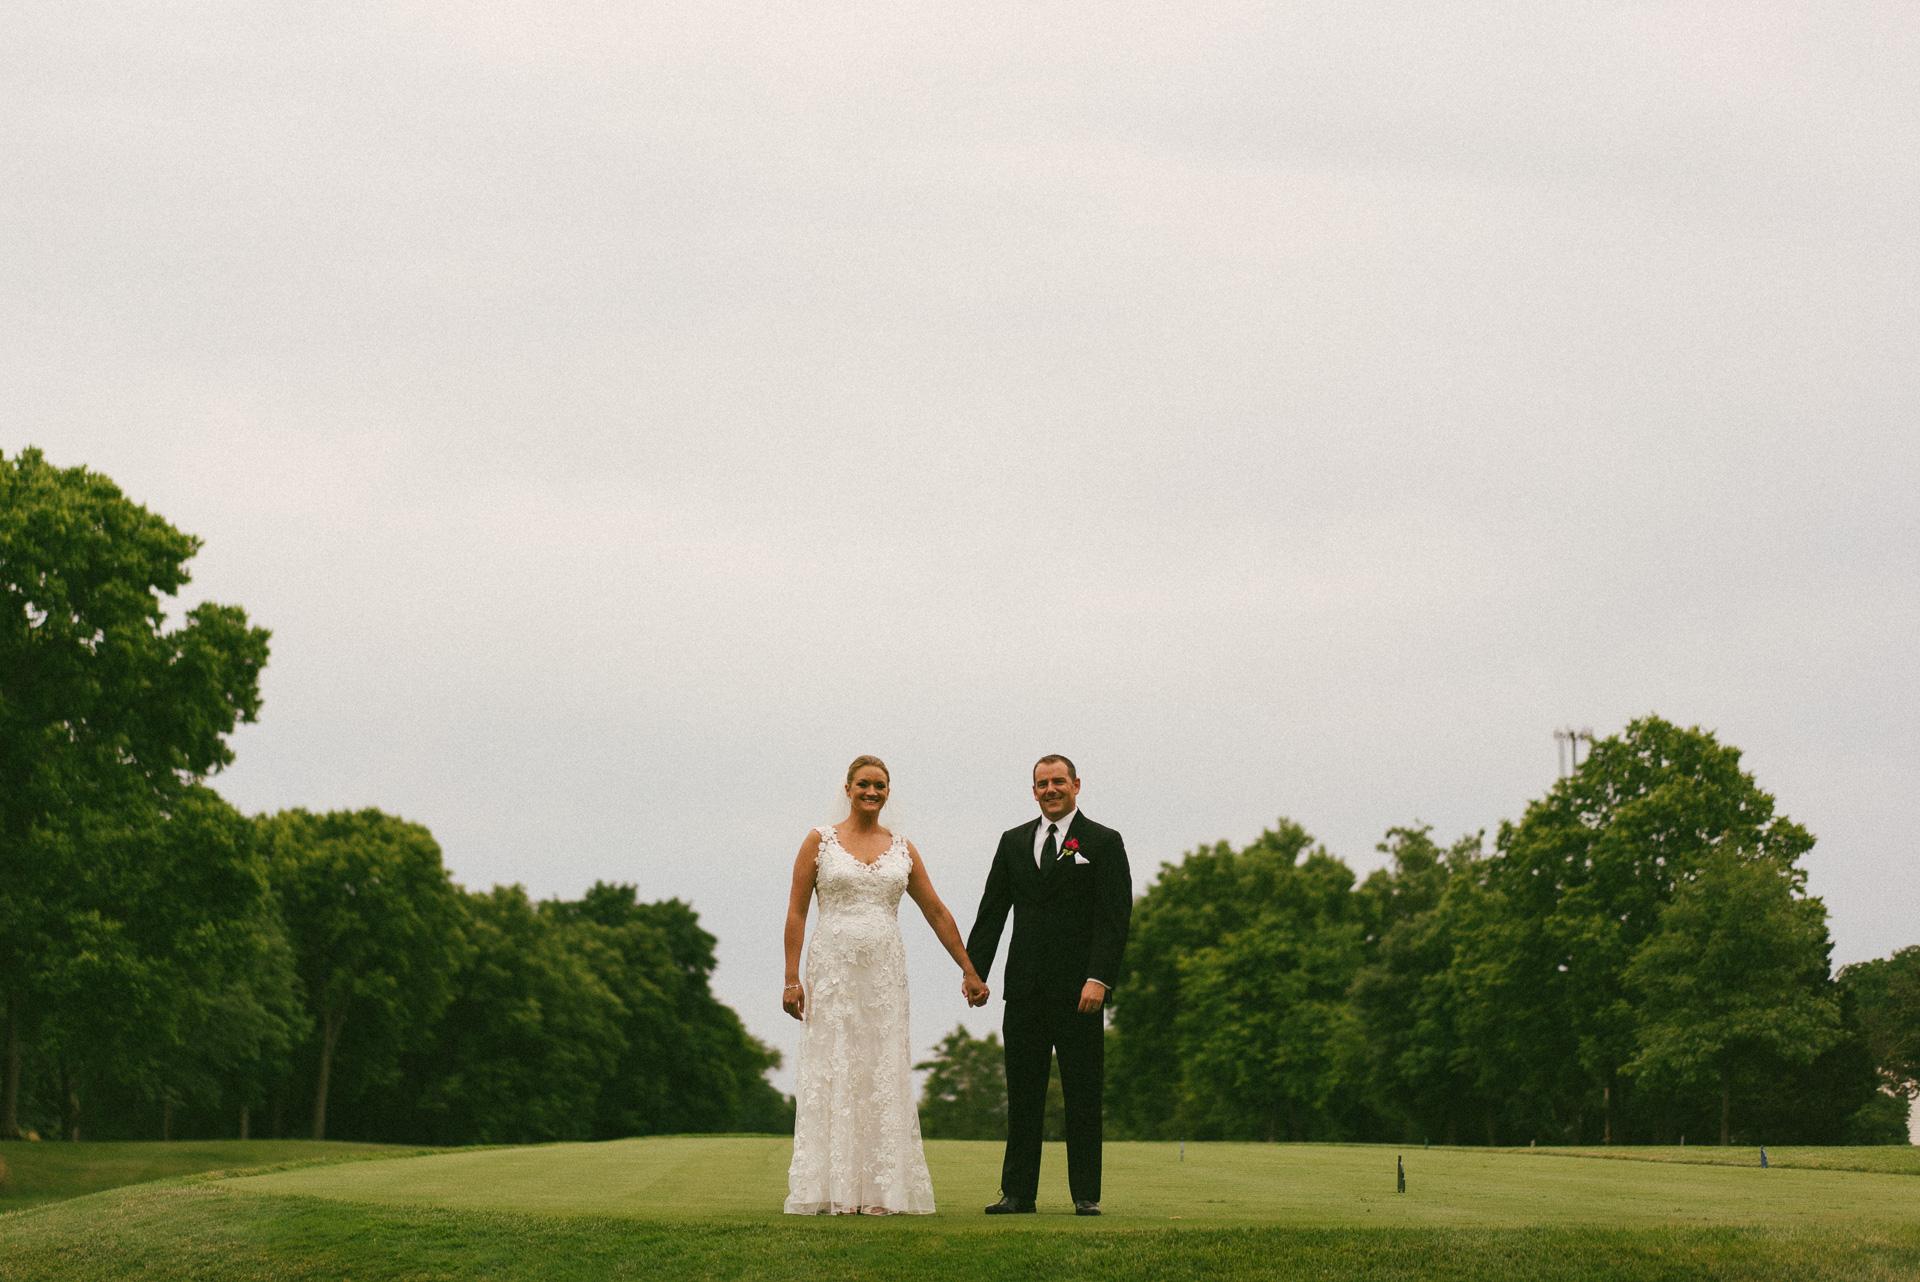 Dayton Wedding Photographer - Bride and Groom Photo